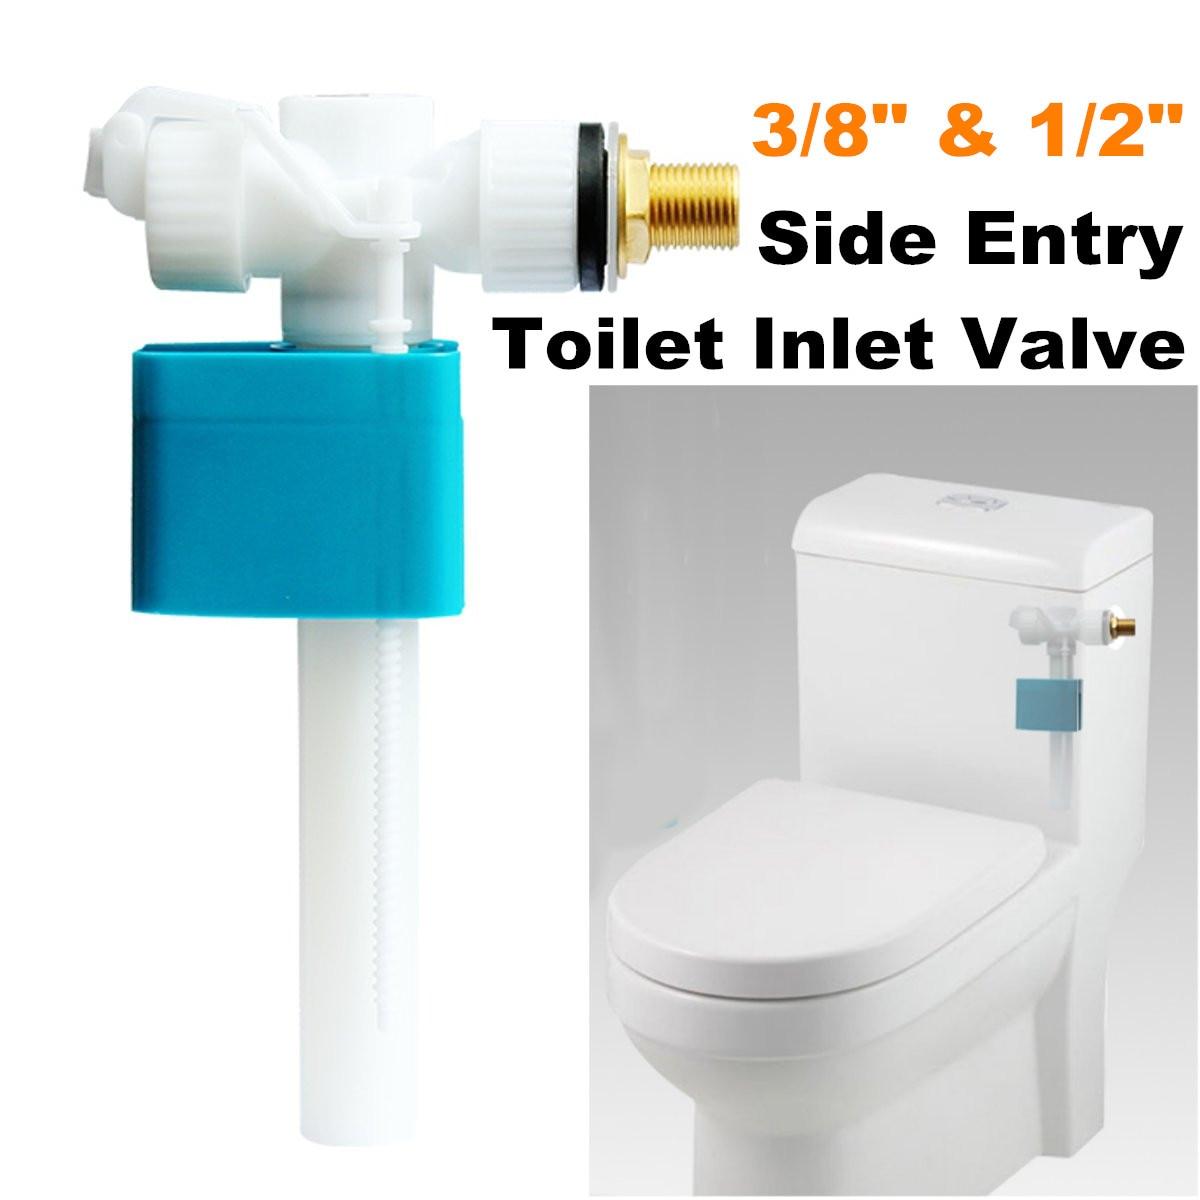 Side Entry Toilet Inlet Valve Cistern Fittings Adjustable Float Filling Valves G3/8